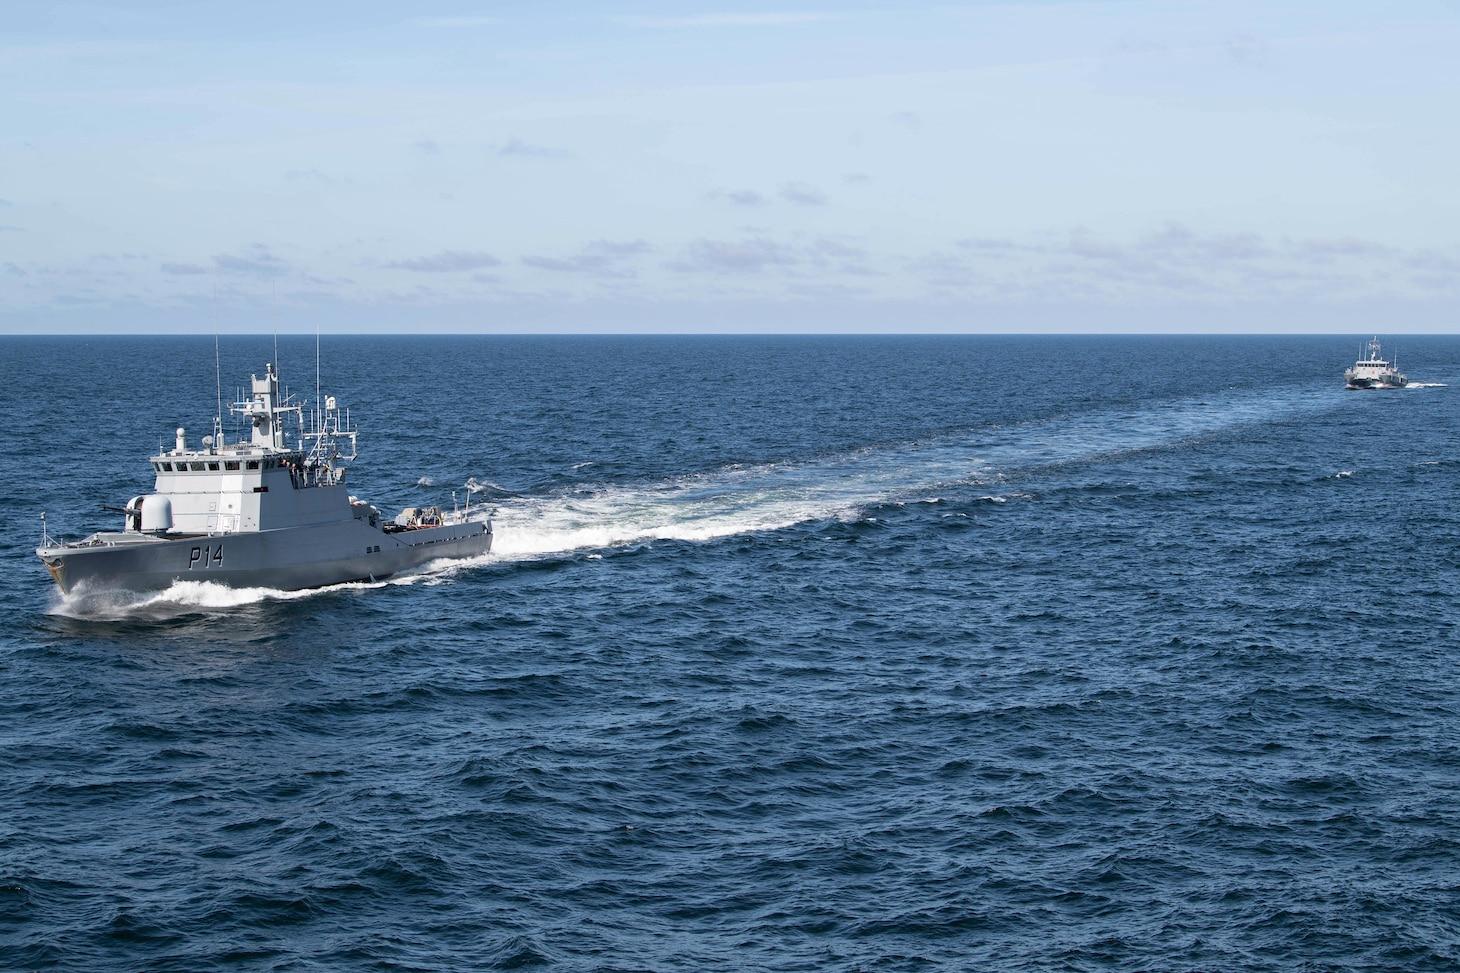 USS Ross (DDG 71); Latvian Naval Forces LVNS Skrunda (P05); Lithuanian Navy LNS Akustaitis (P14)